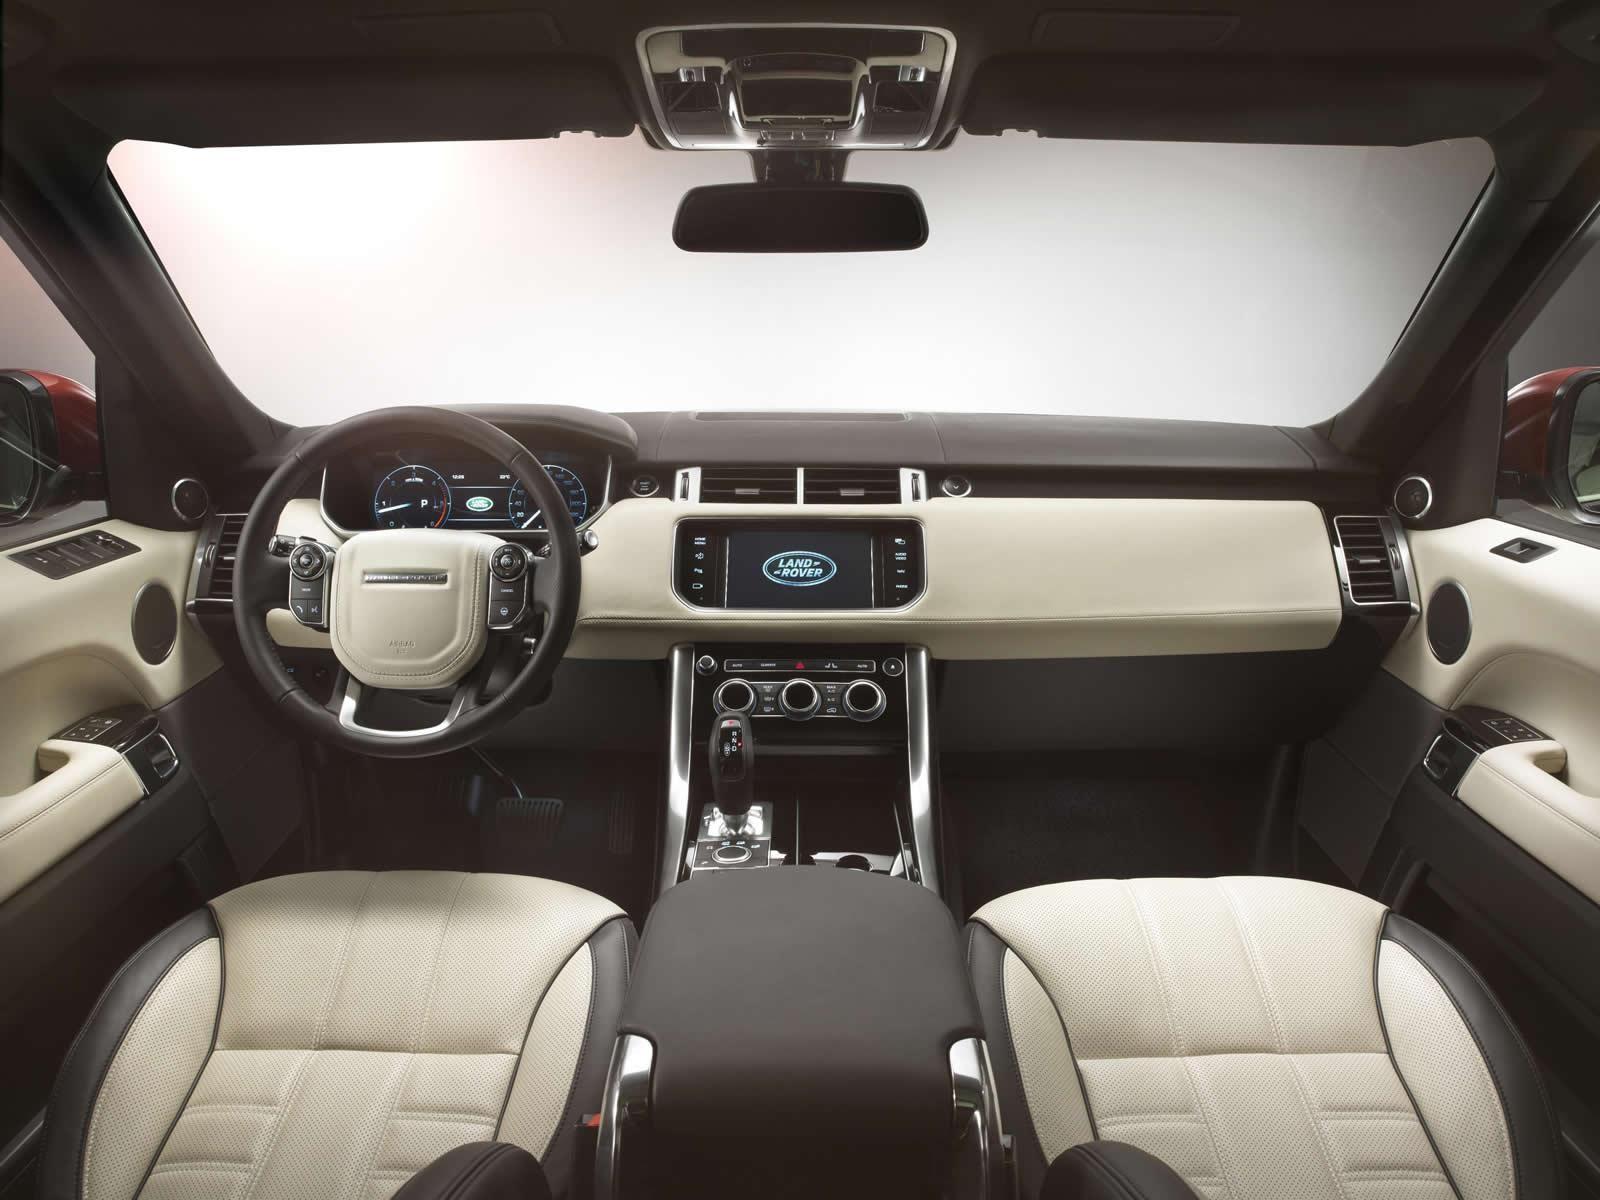 2014 Range Rover Sport. Oooo lah lah. Range rover